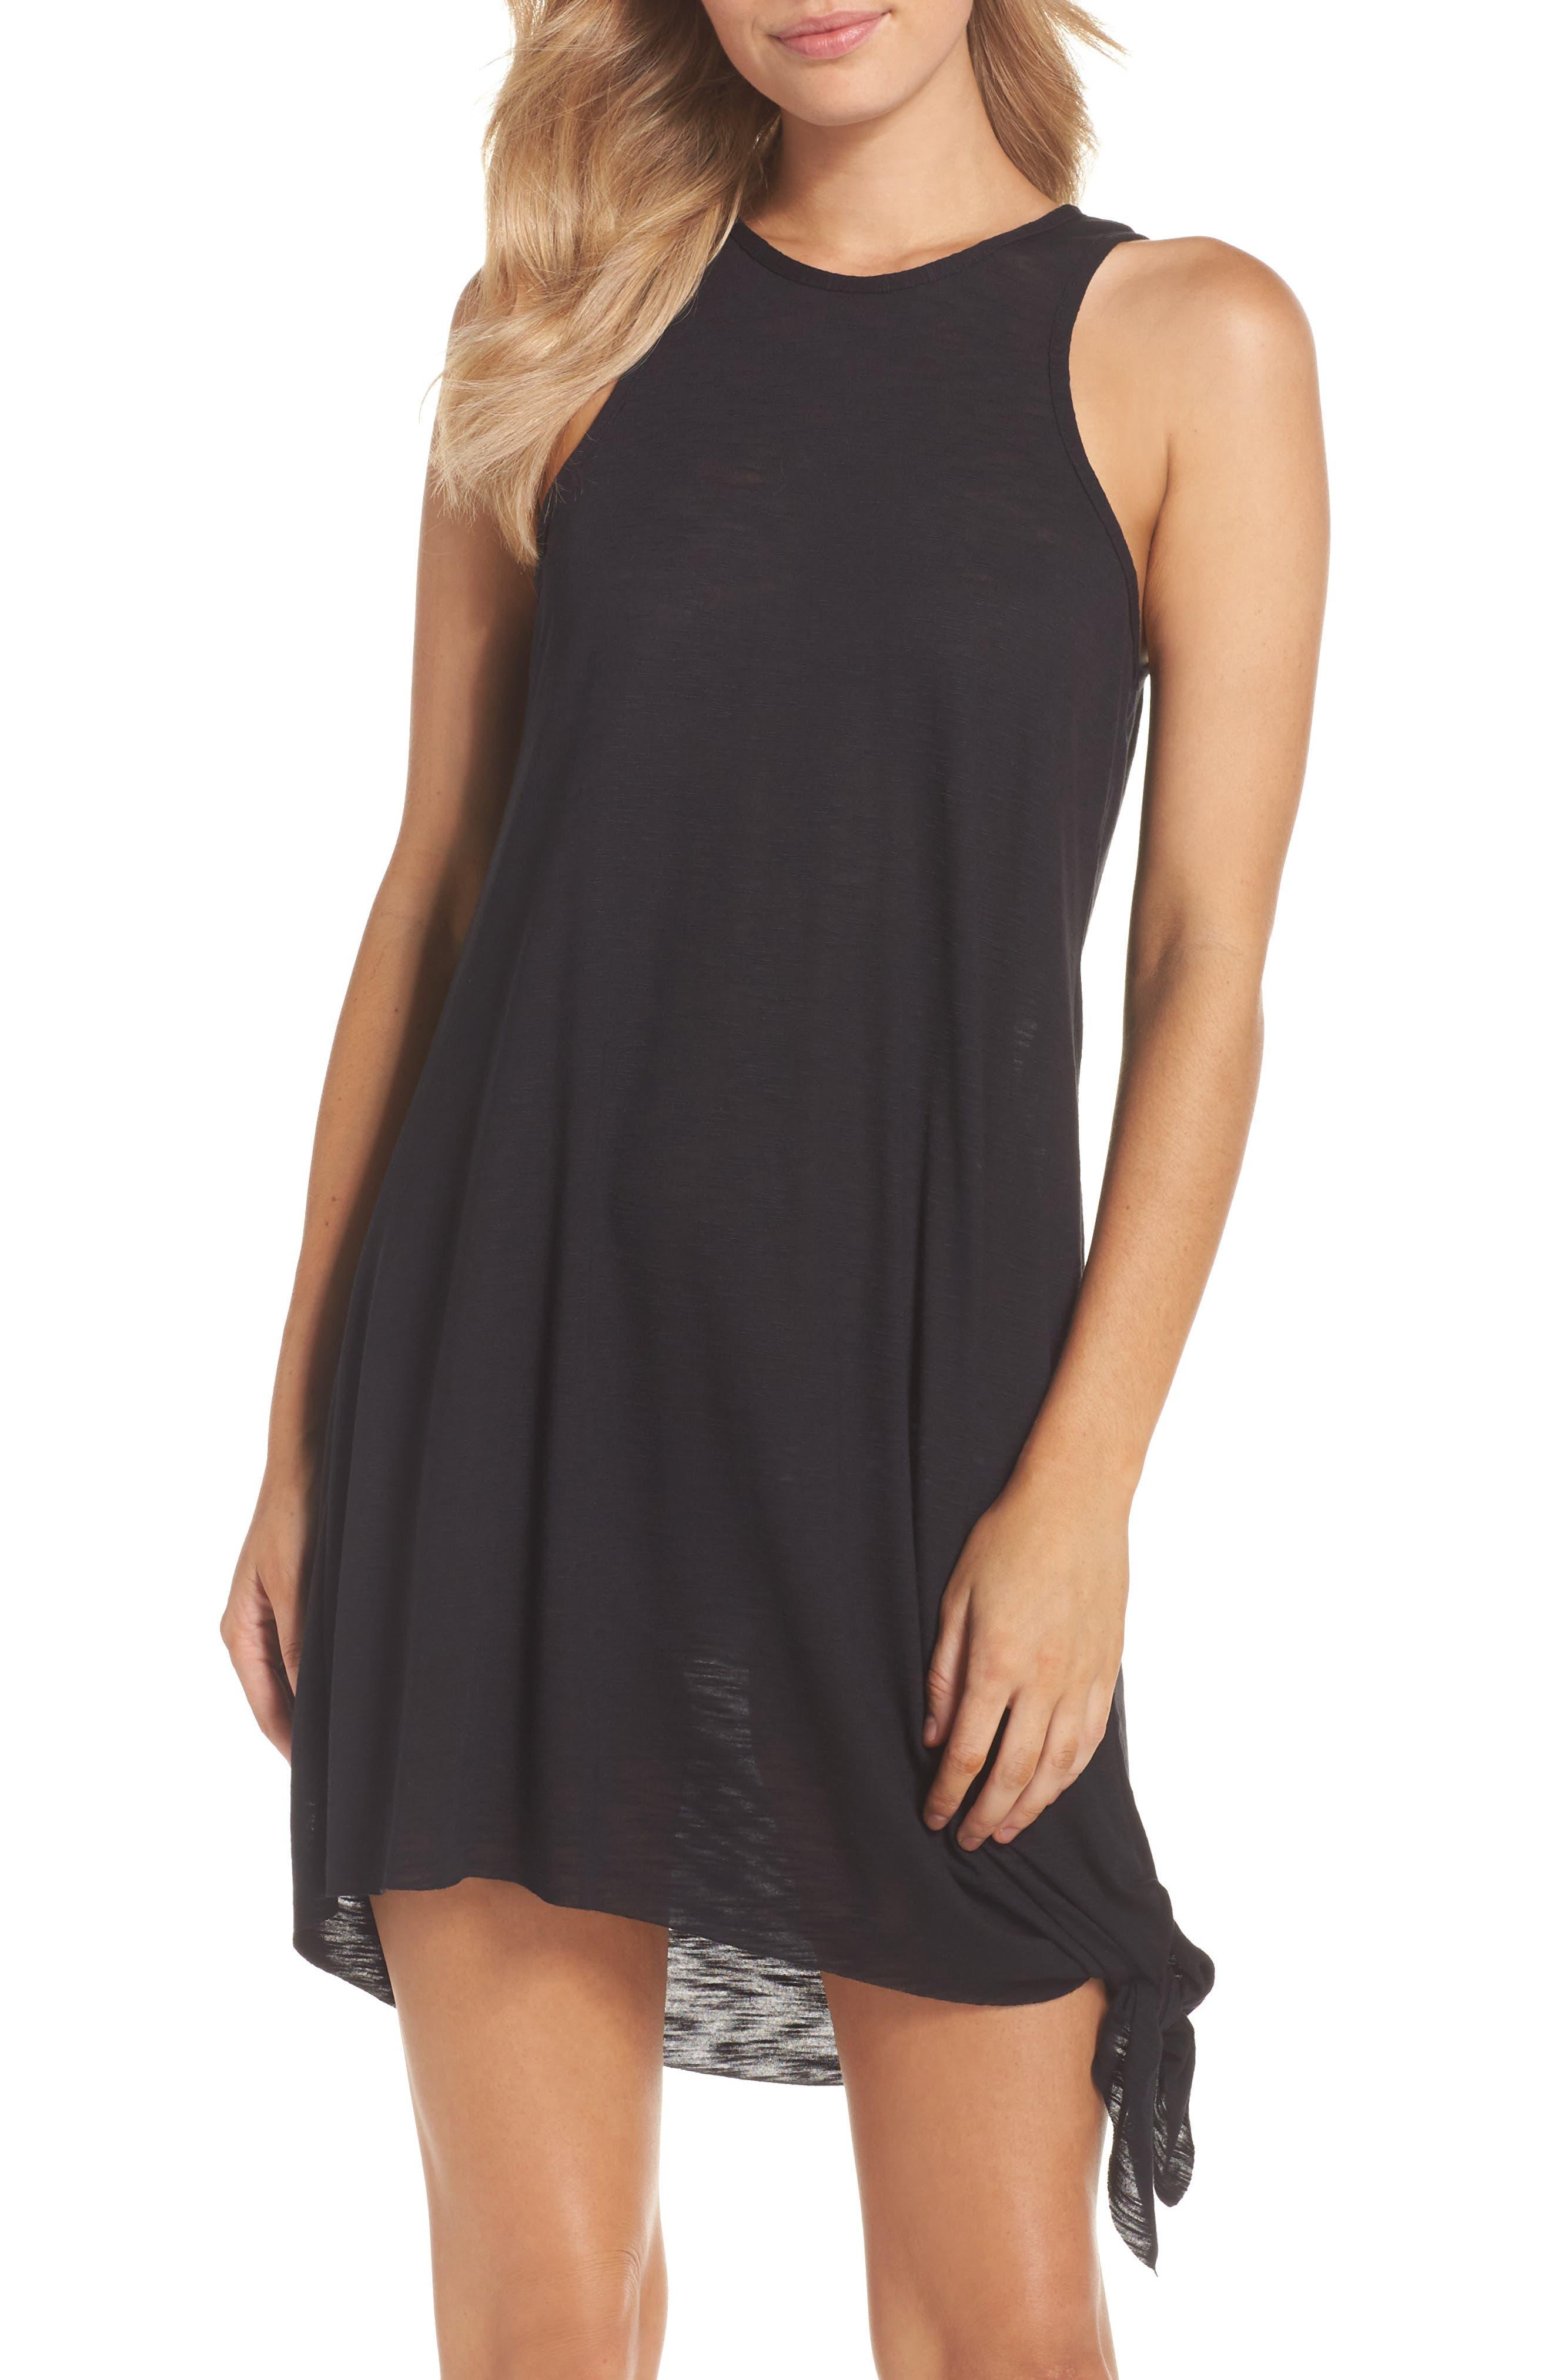 Breezy Basics Cover-Up Dress,                         Main,                         color, BLACK